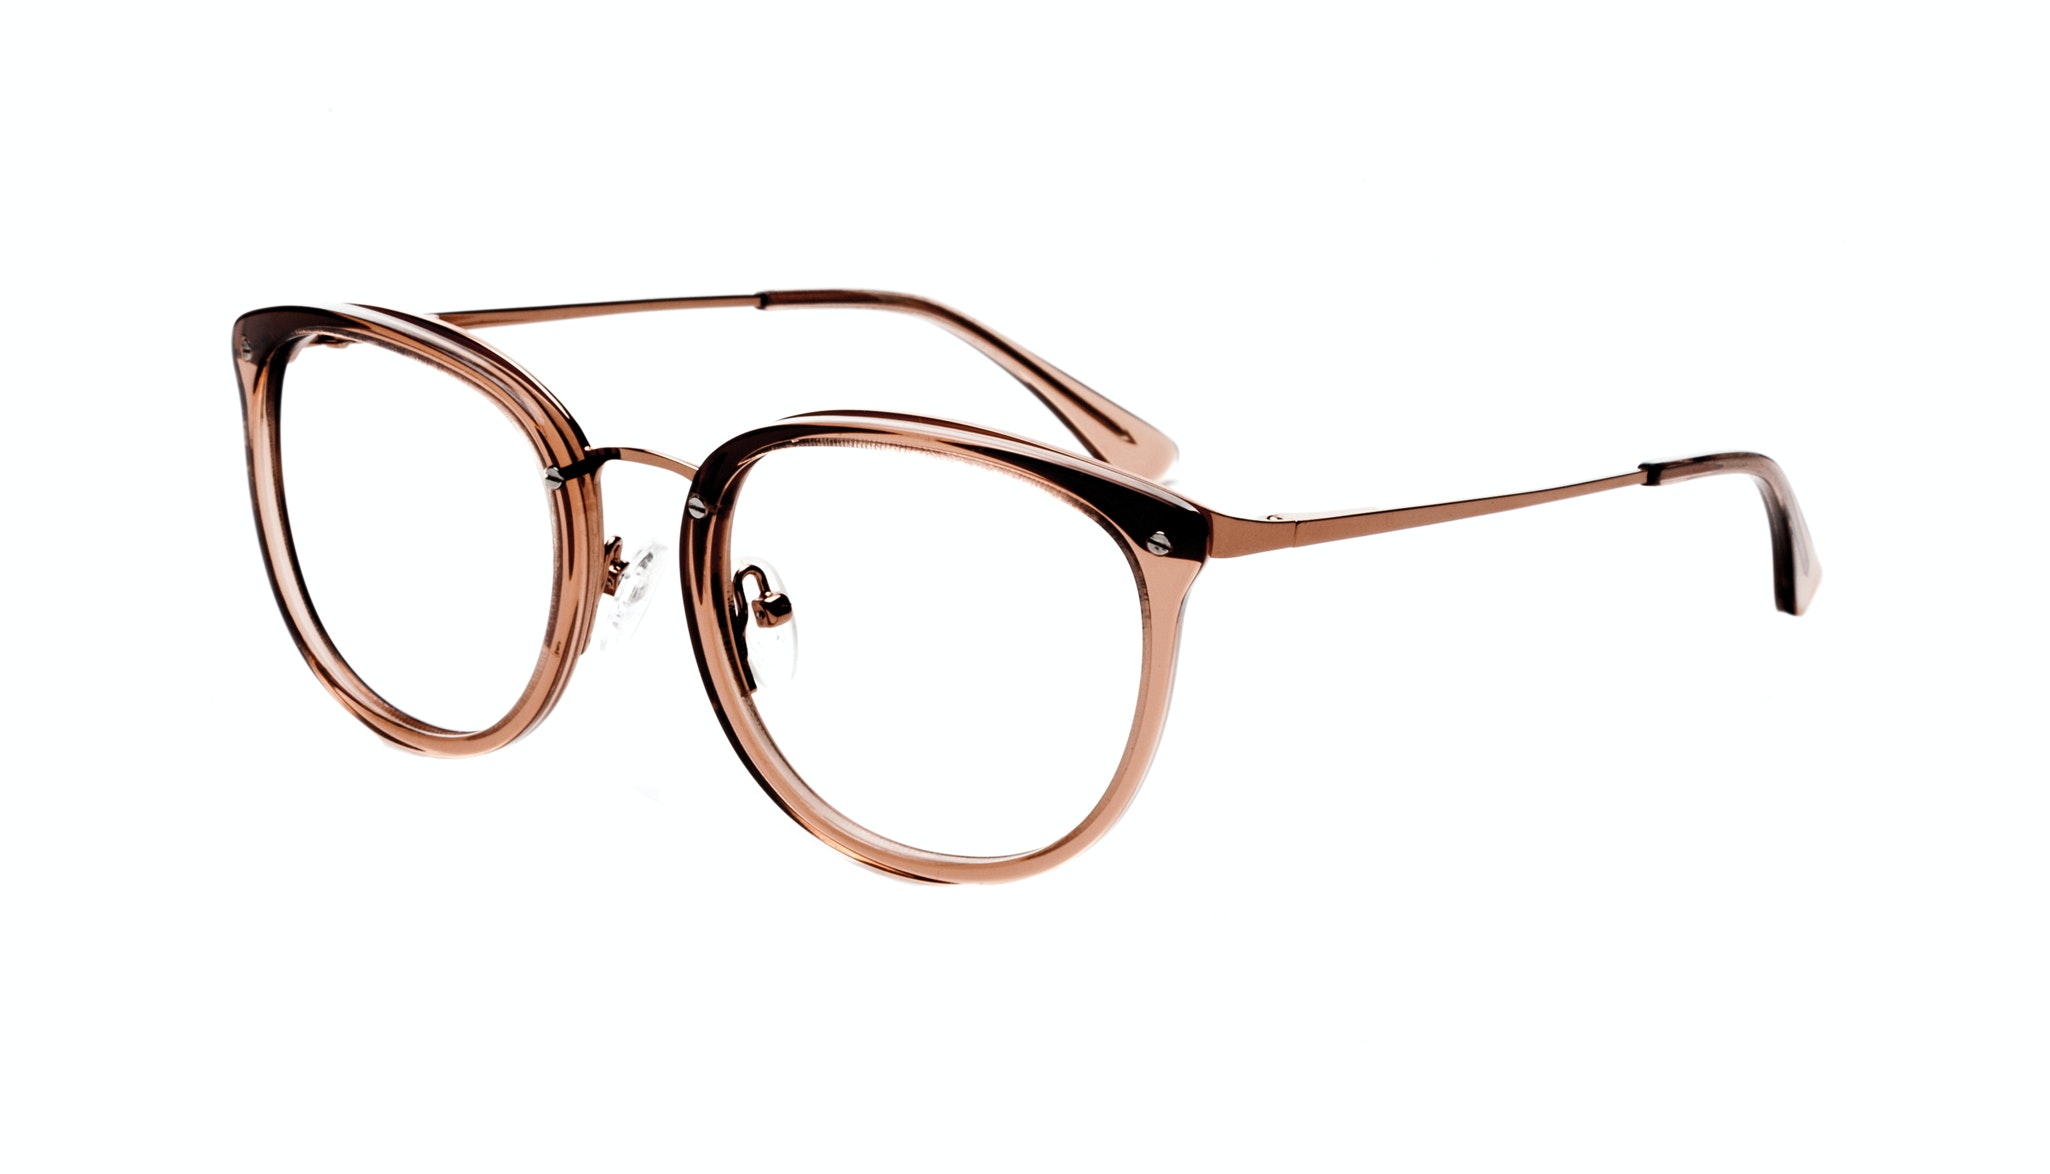 Affordable Fashion Glasses Square Round Eyeglasses Women Amaze Rose Tilt